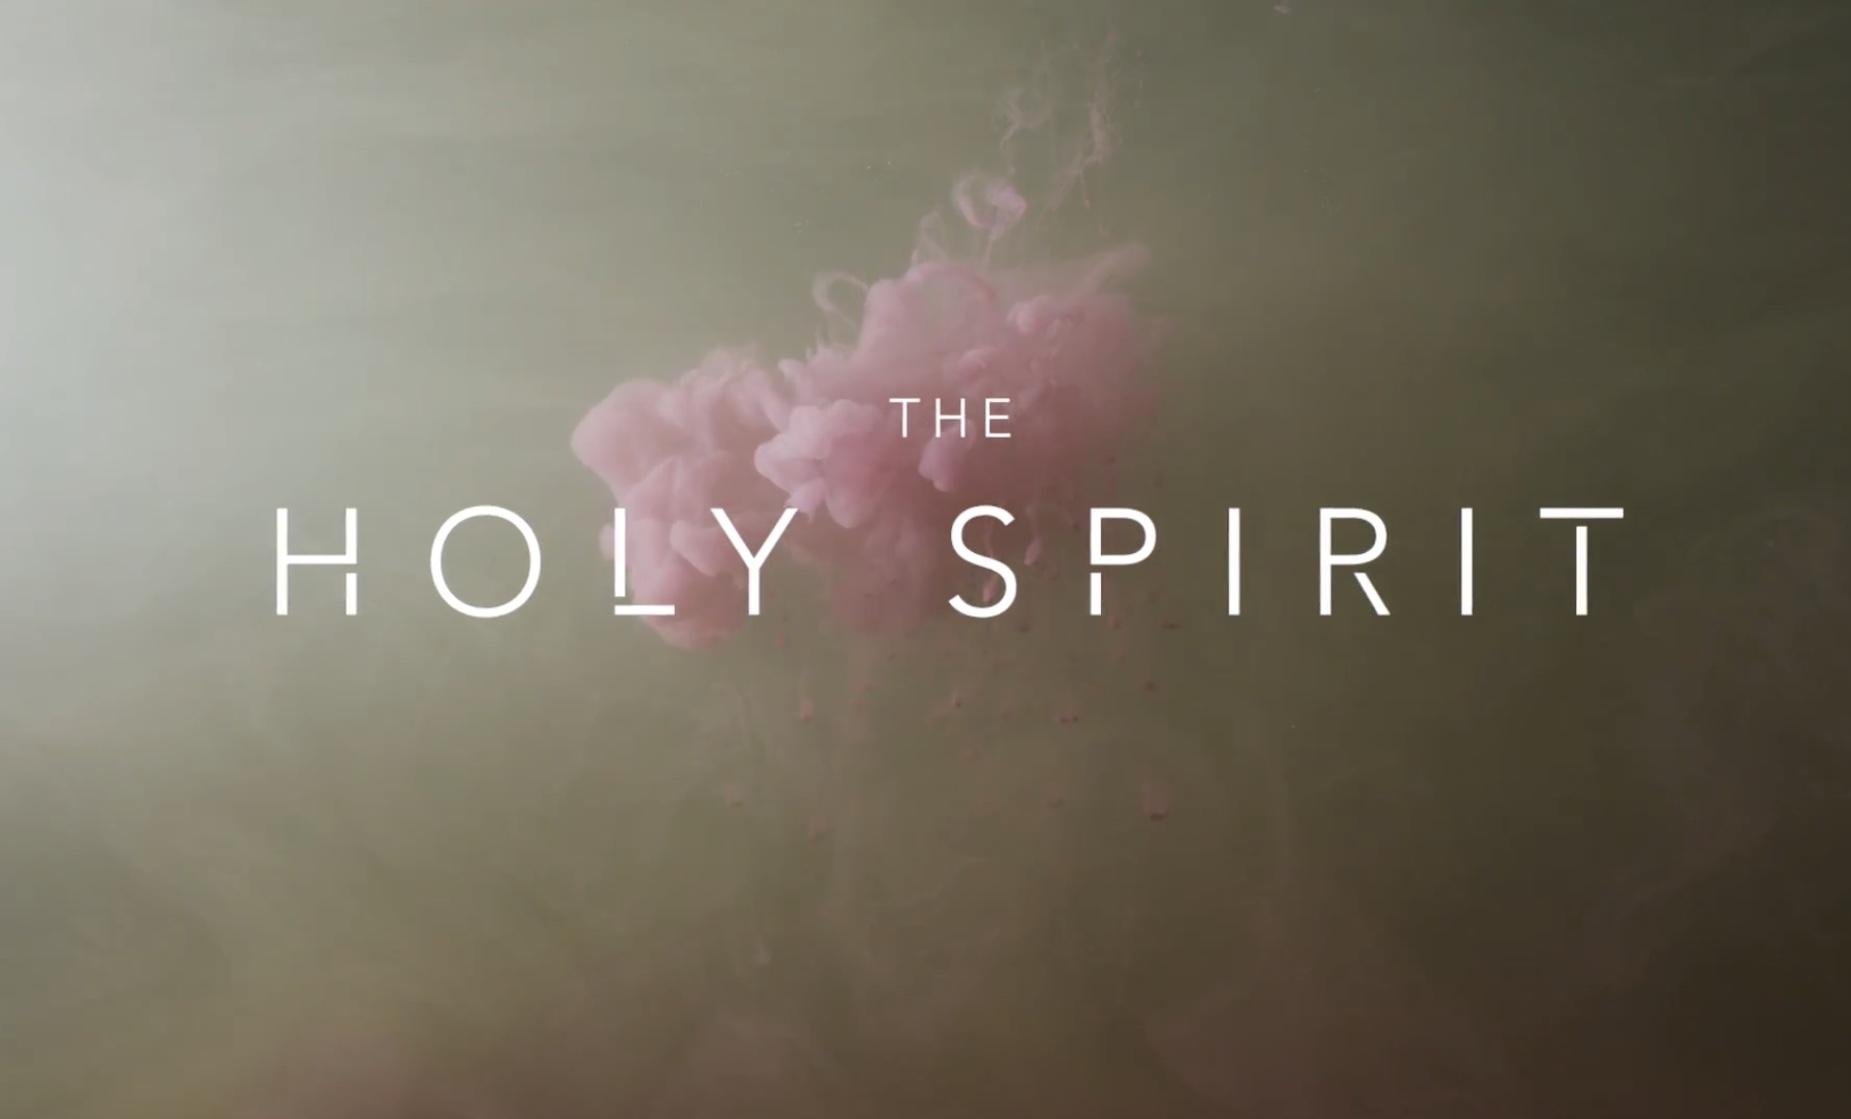 The Holy Spirit 16-9.jpg